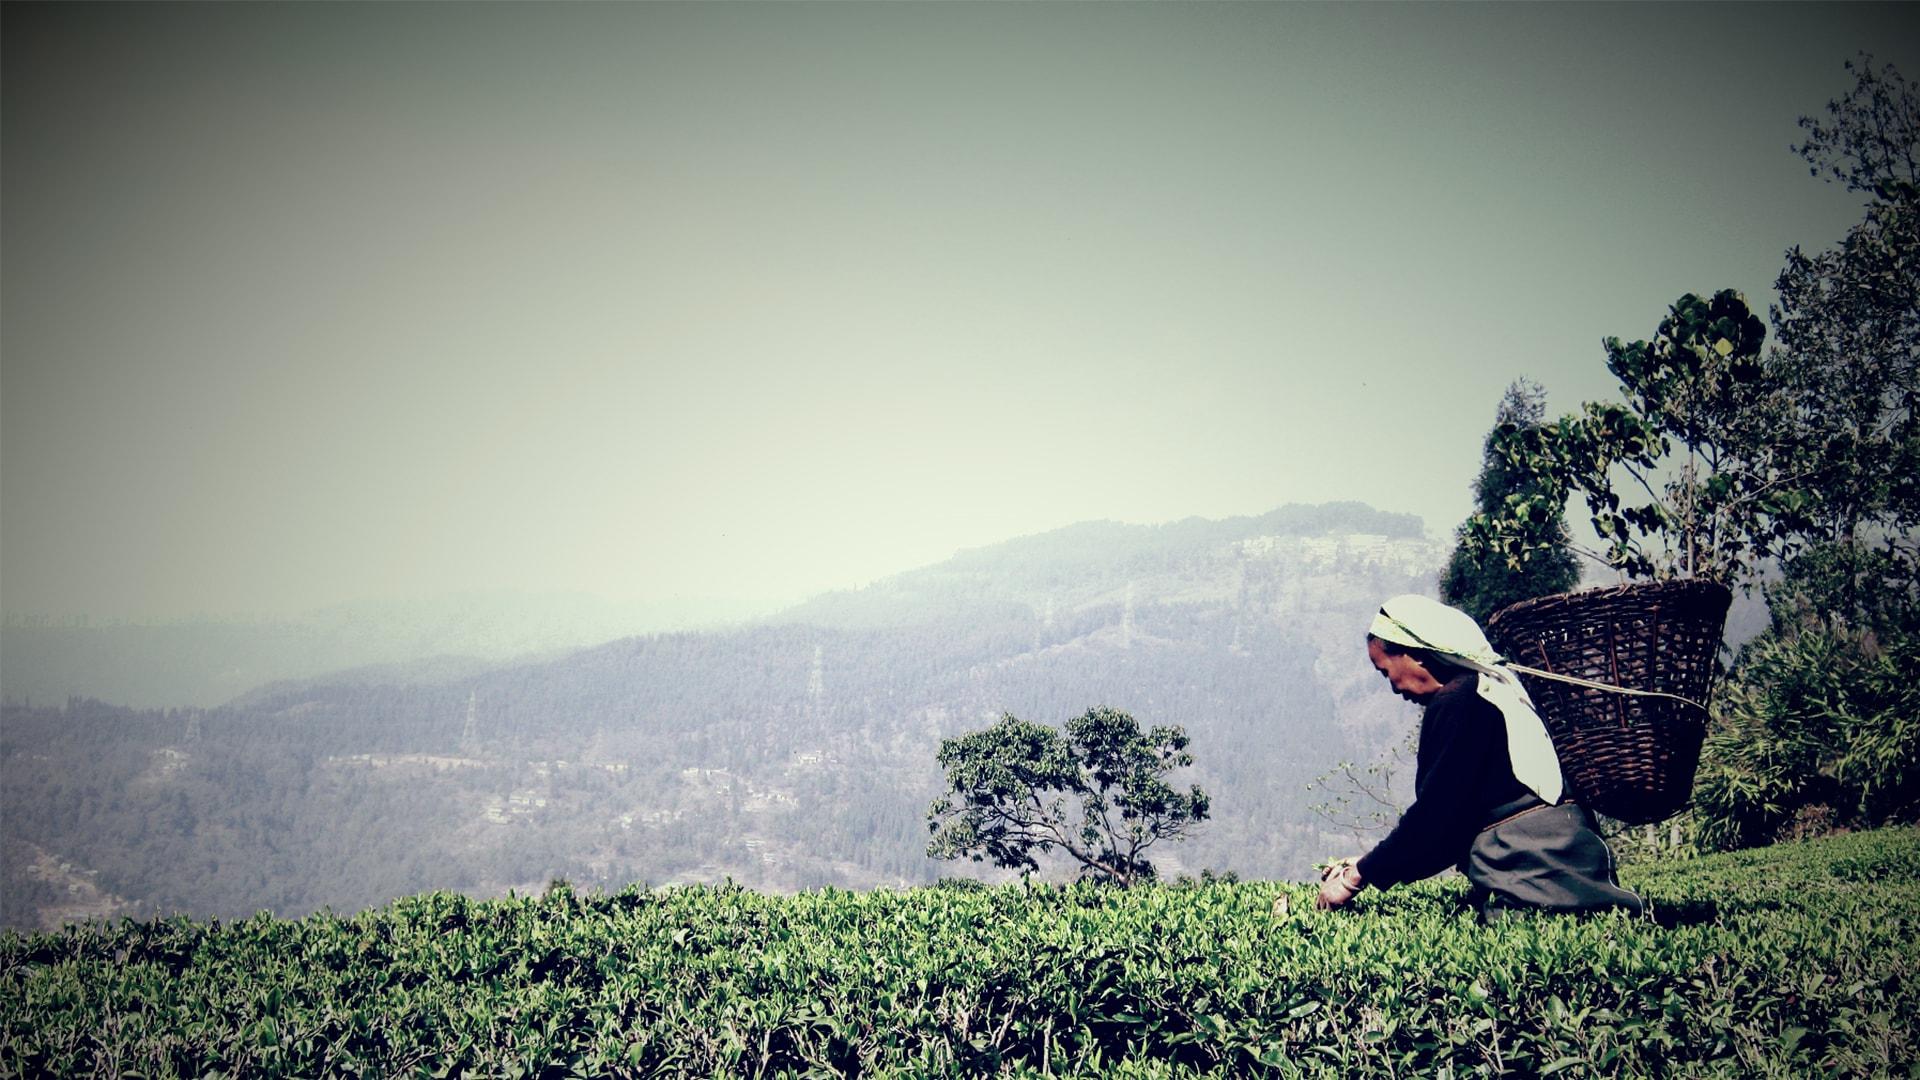 Anbassa-artisan-torrefacteur-different-type-de-the-Niroula-Tea-Farm-min